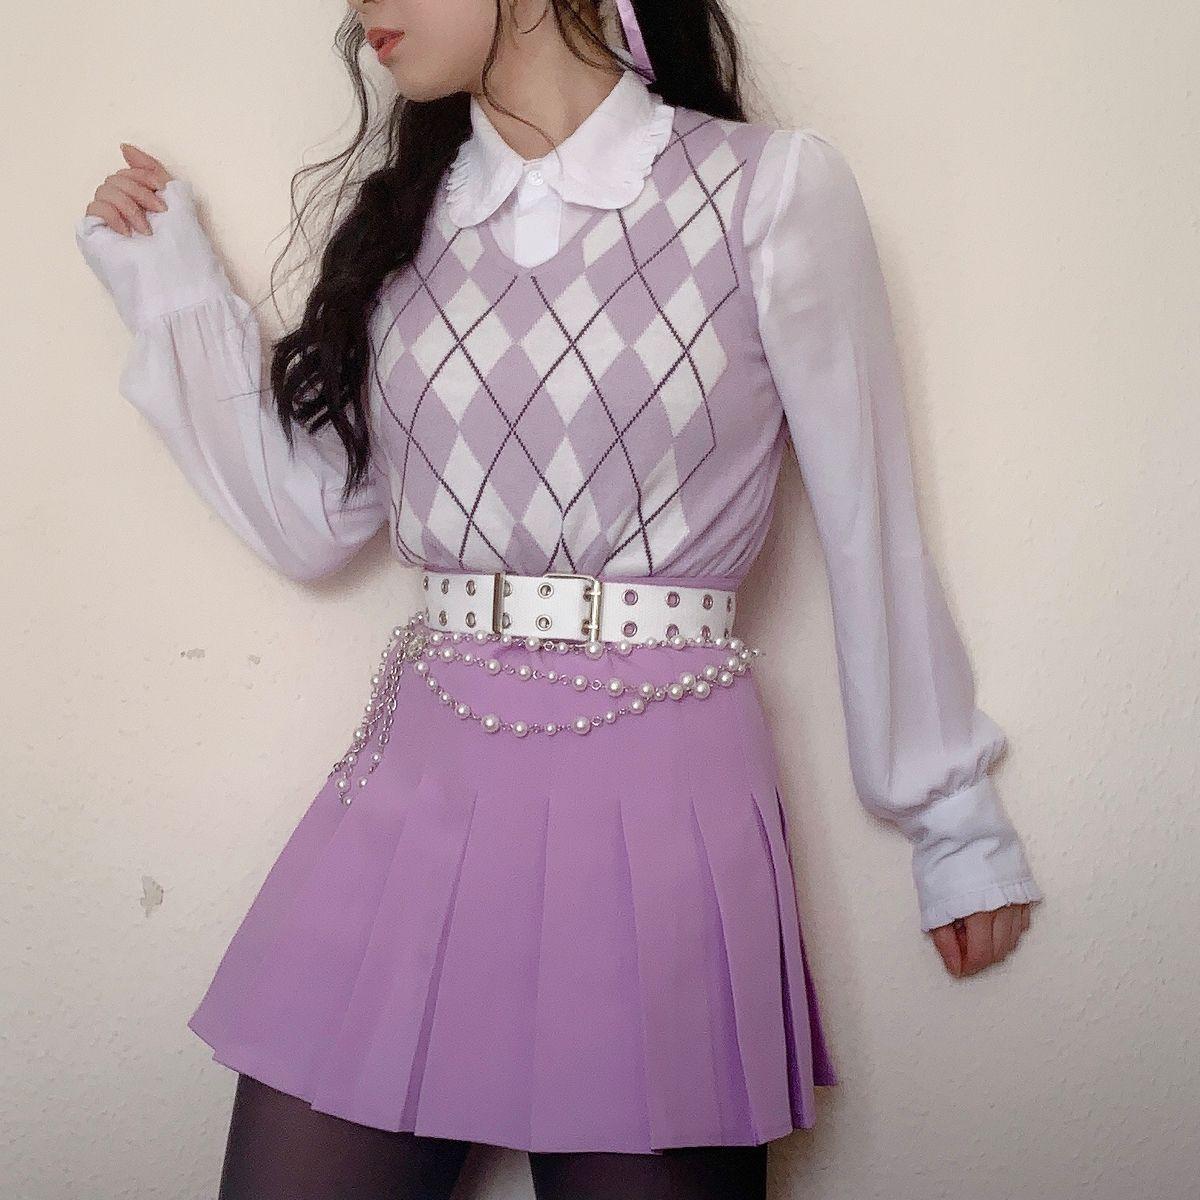 Purple In 2021 Purple Outfits Kawaii Fashion Outfits Kpop Outfits [ 1200 x 1200 Pixel ]